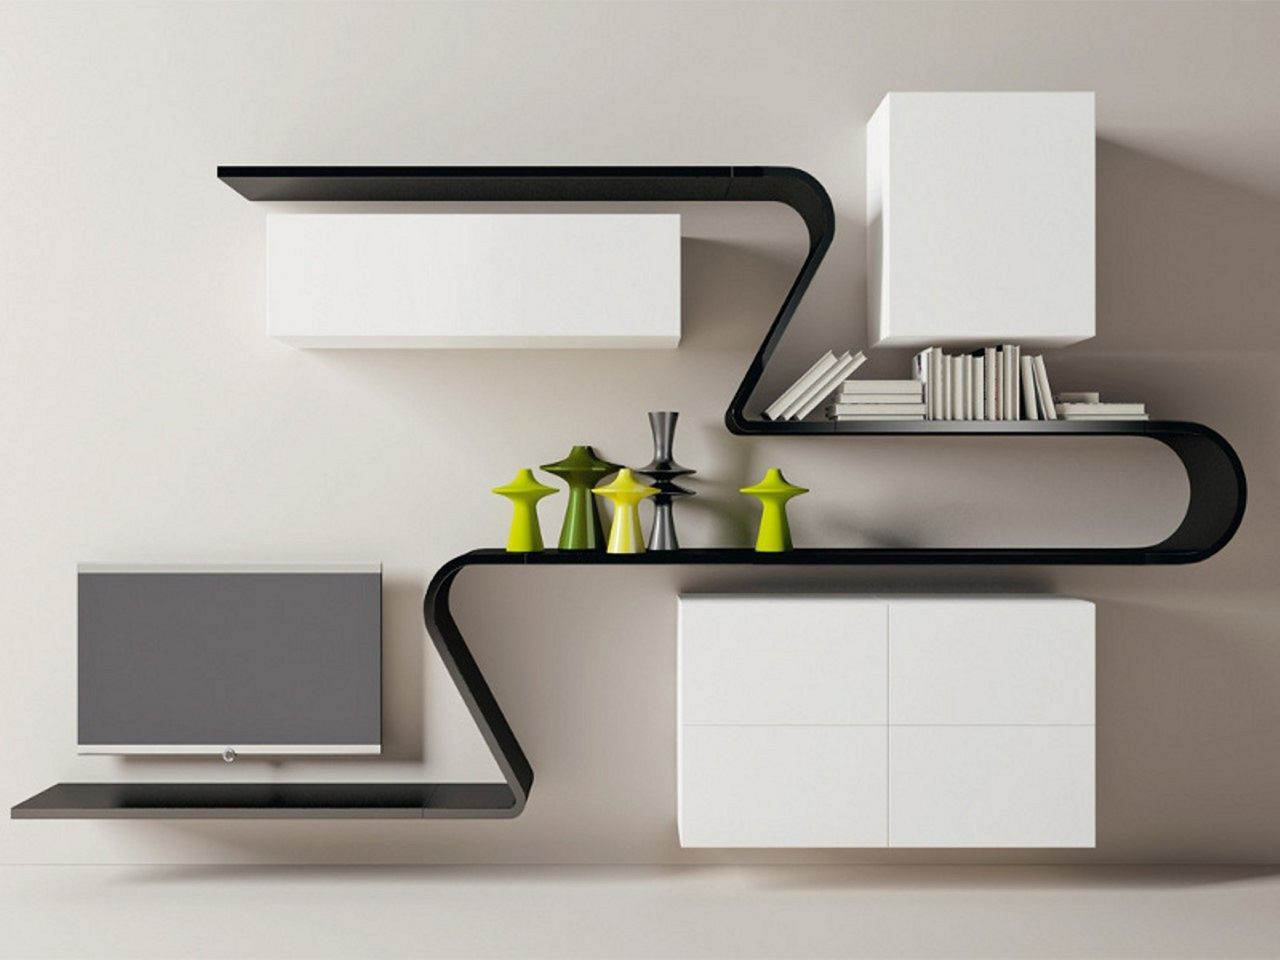 25 Creative Wall Shelves Design Ideas For Lovely Home Decoration Ideas Dexorate Wall Shelves Design Unique Wall Shelves Wall Shelf Decor